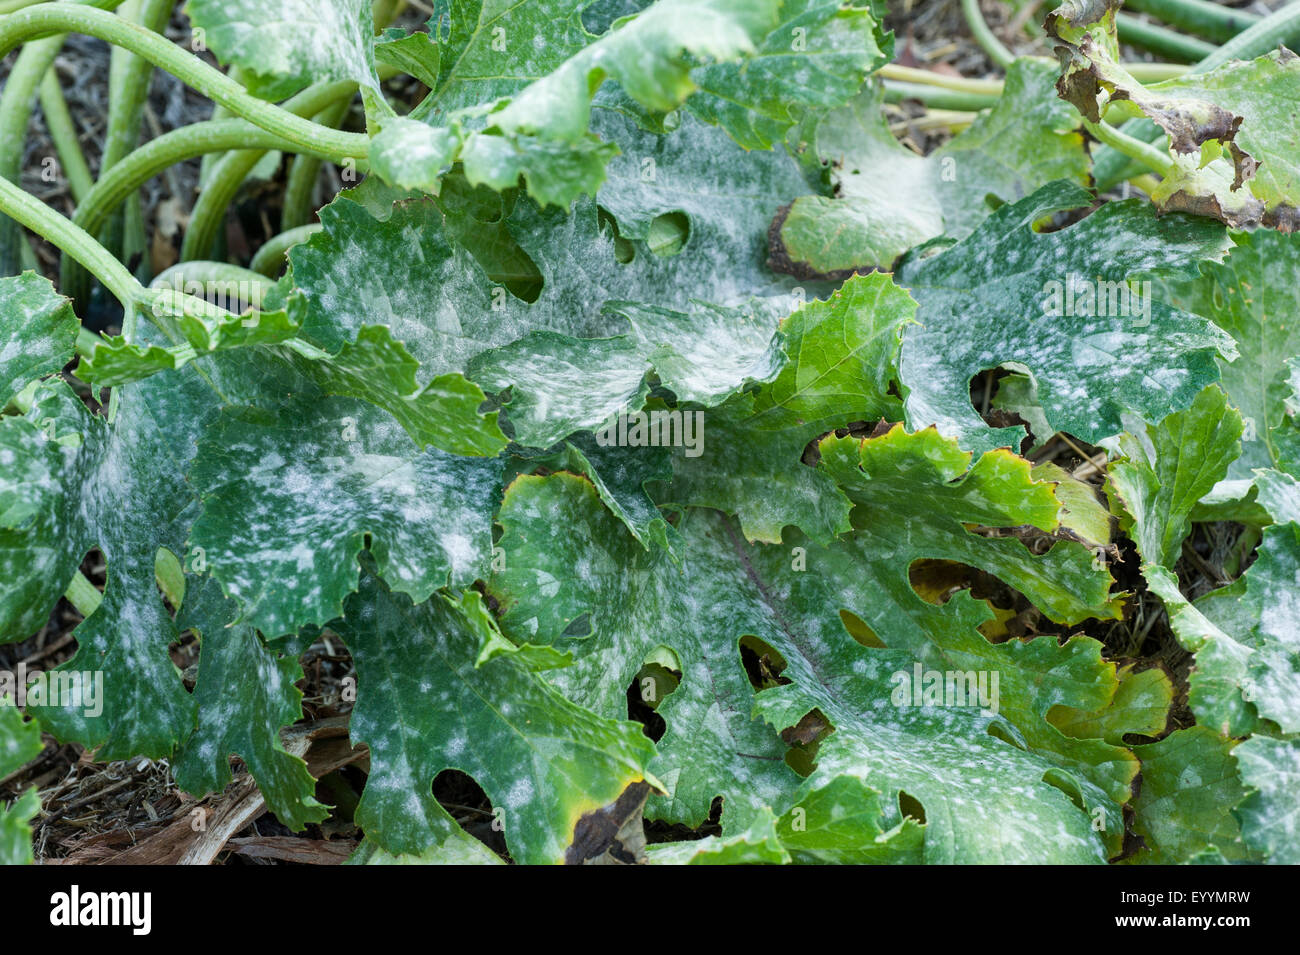 Severe powdery mildew symptoms on zucchini leaves - Stock Image